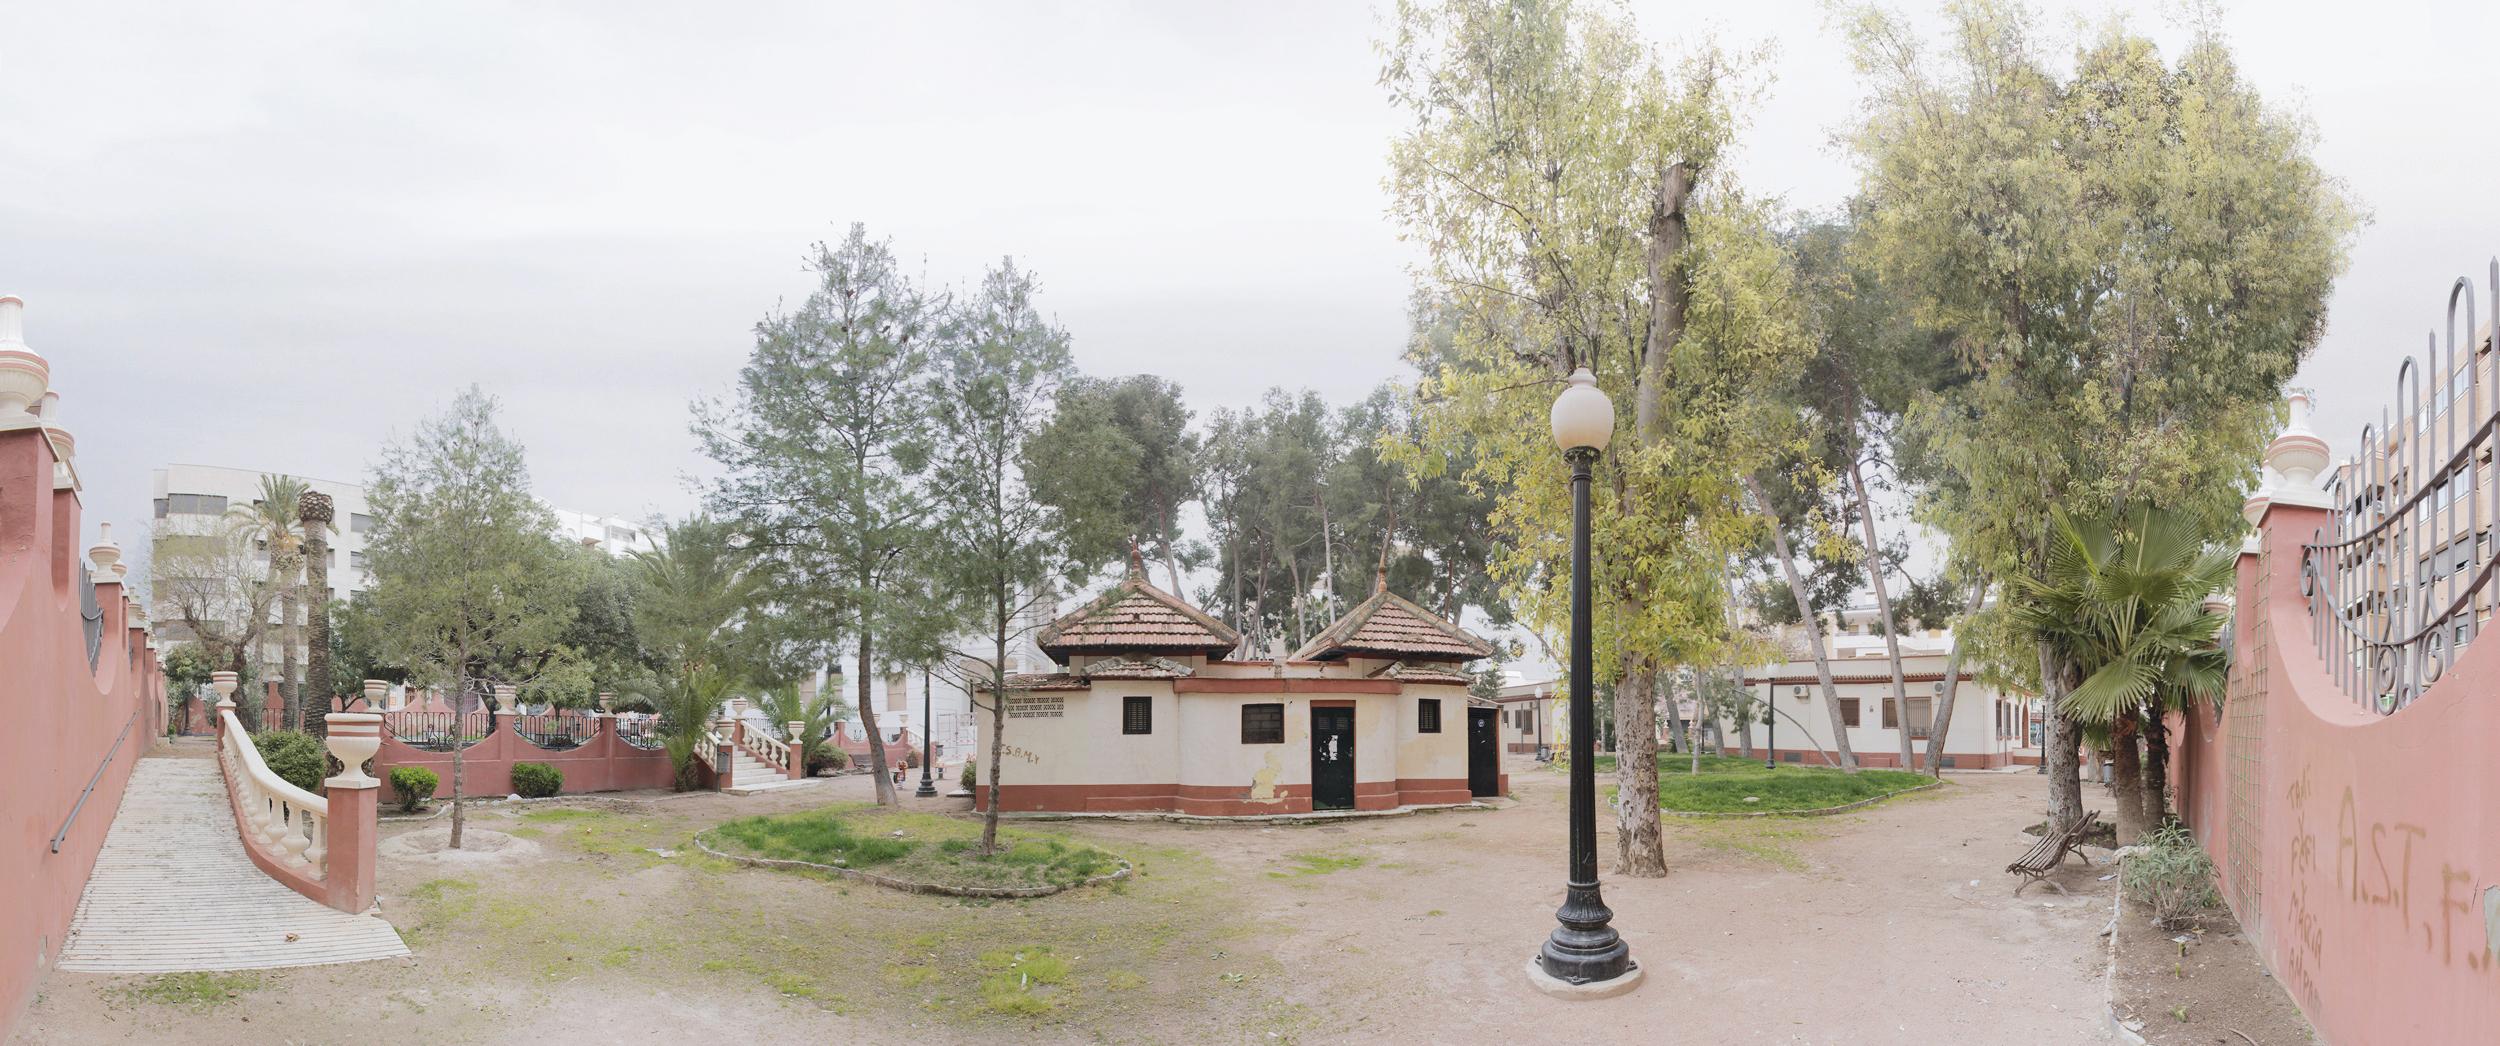 plan-director-jardin-de-la-musica-elda-casa-grande-03-cafeteria-kiosco-fotomontaje-render-visualizacion-montaje-panoramica-estado-actual.jpg